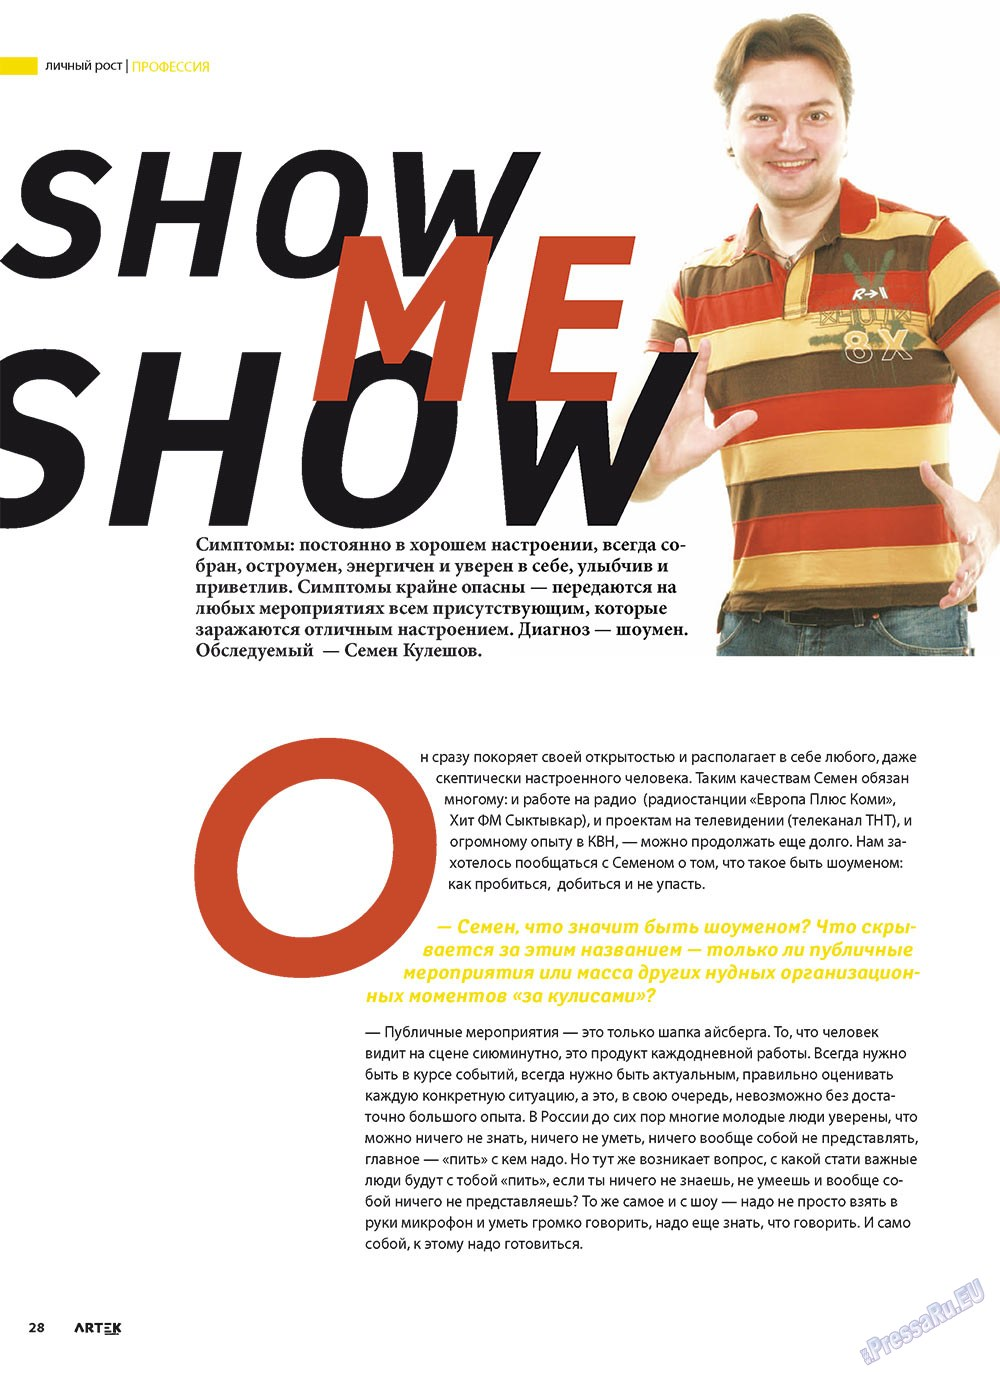 Артек (журнал). 2011 год, номер 1, стр. 30